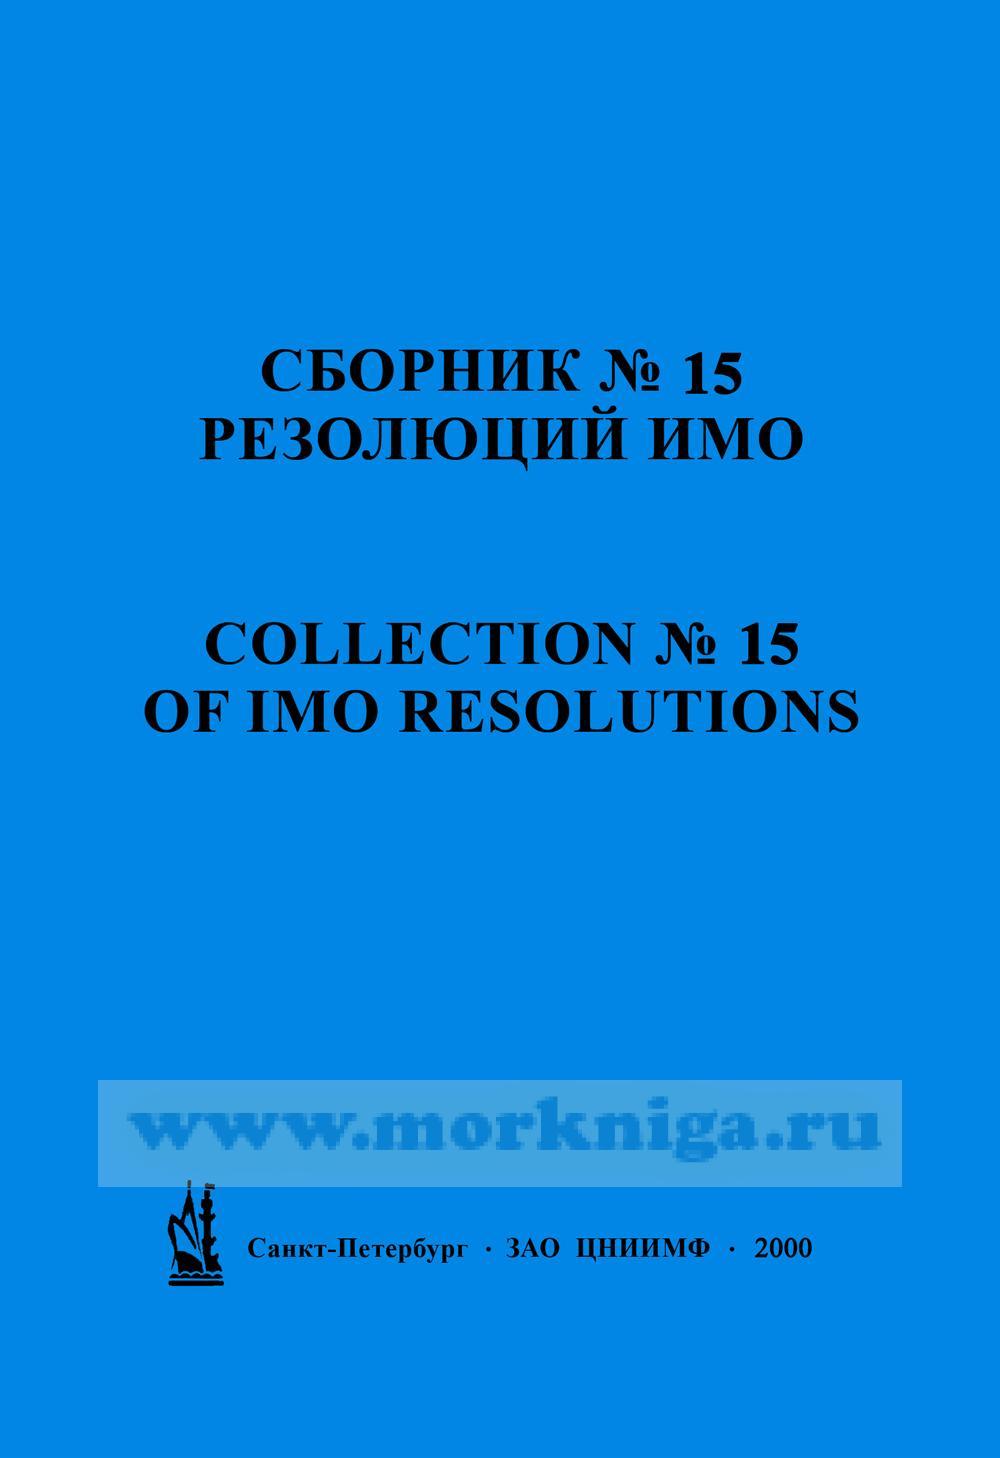 Сборник № 15 резолюций ИМО. Collection No.15 of IMO Resolutions